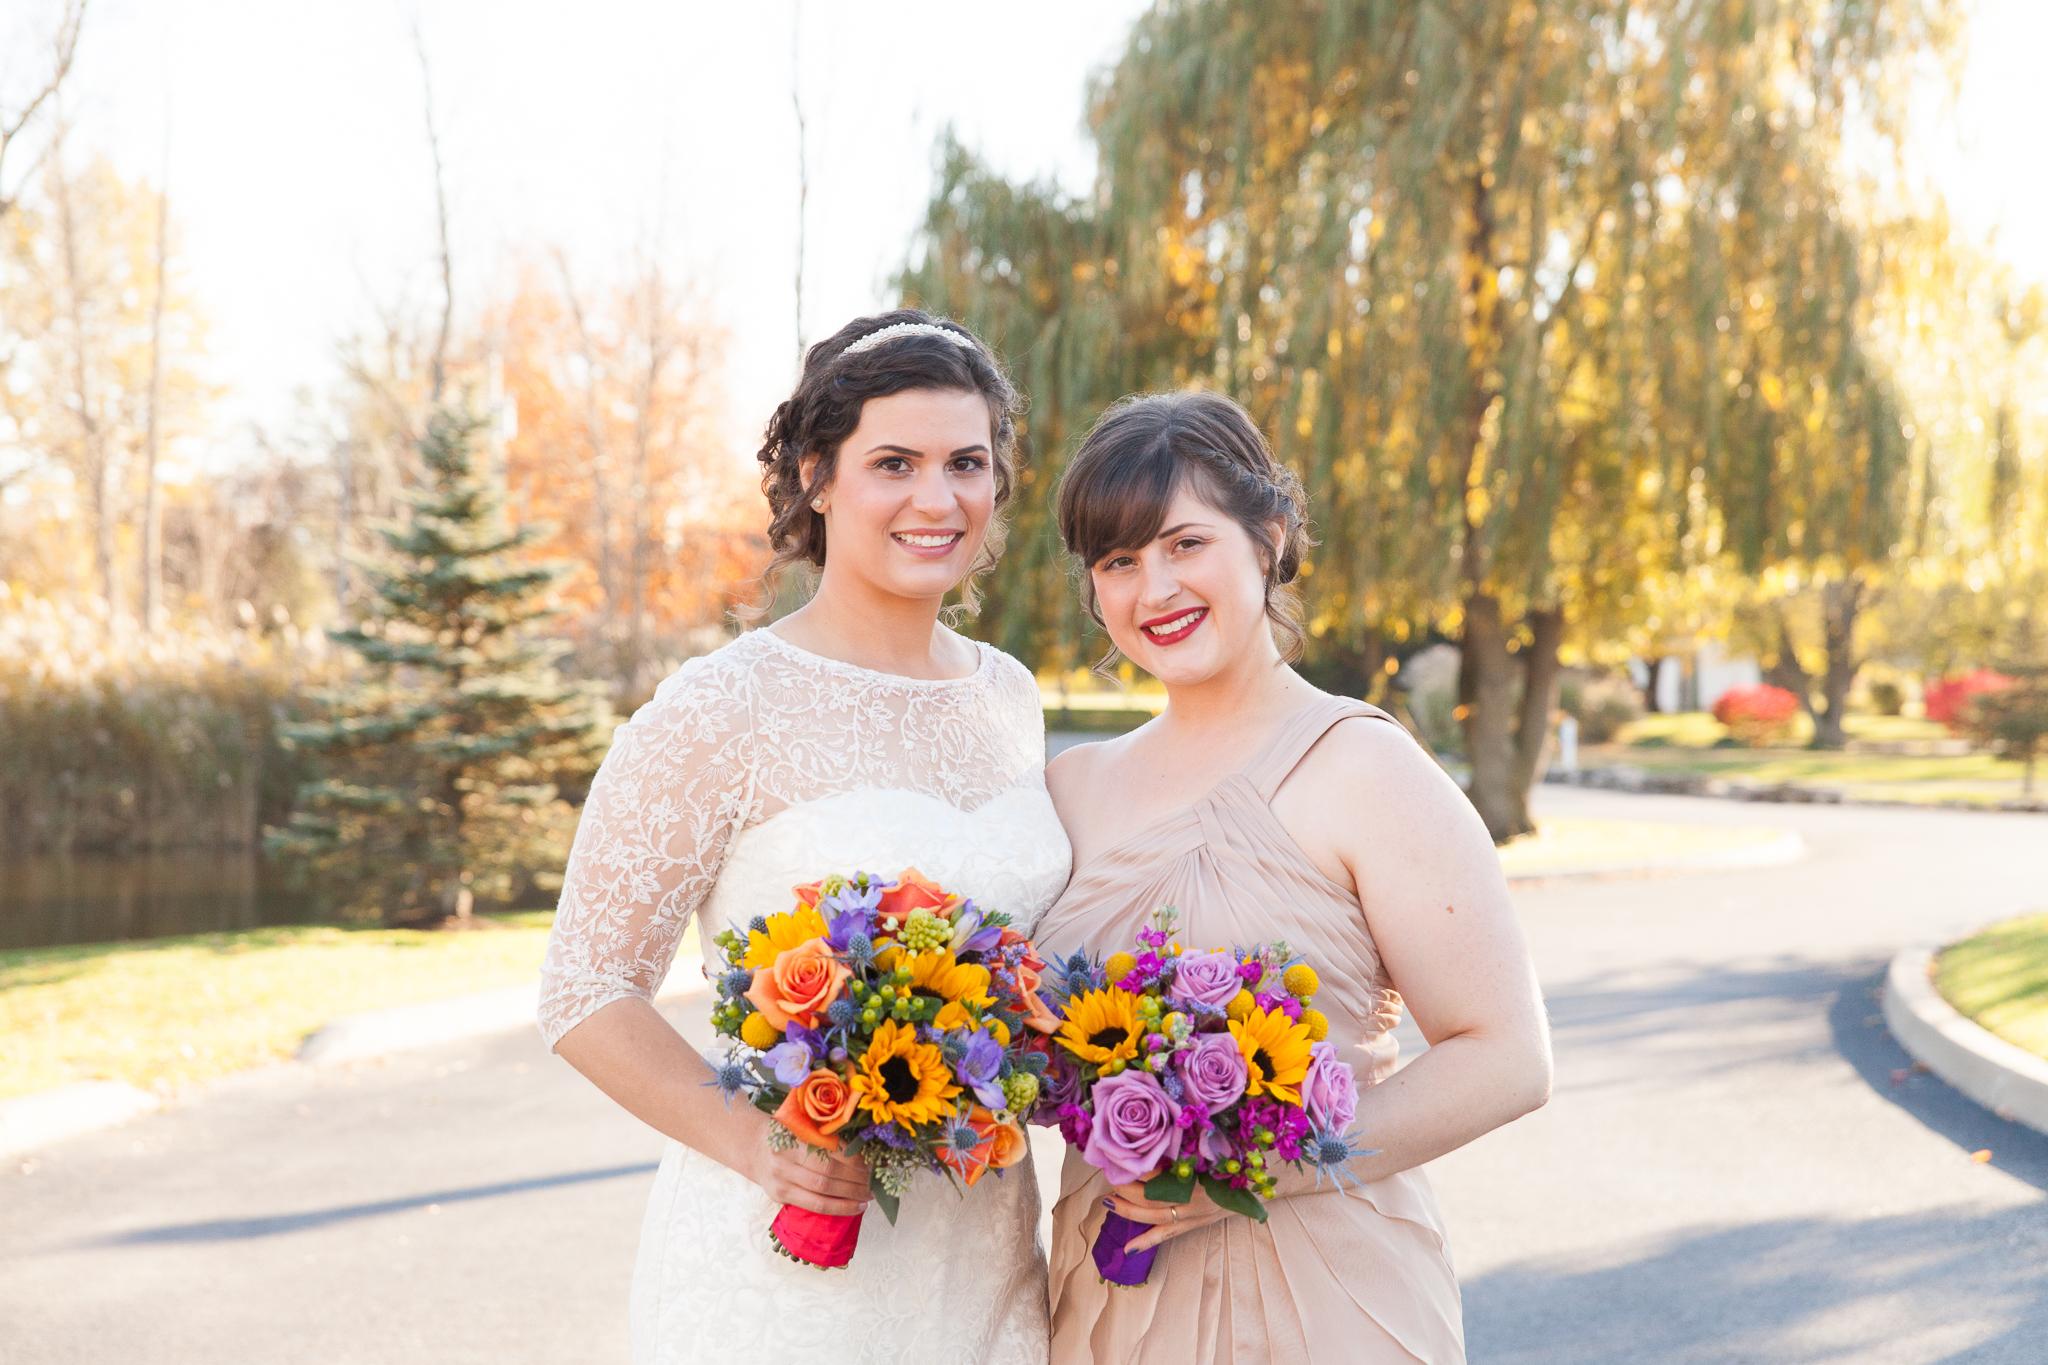 camuglia-whomstudio-chelsea_and_andy-nycphotographer-wedding-brooklyn-buffalo-timberlodge-032-0172.jpg